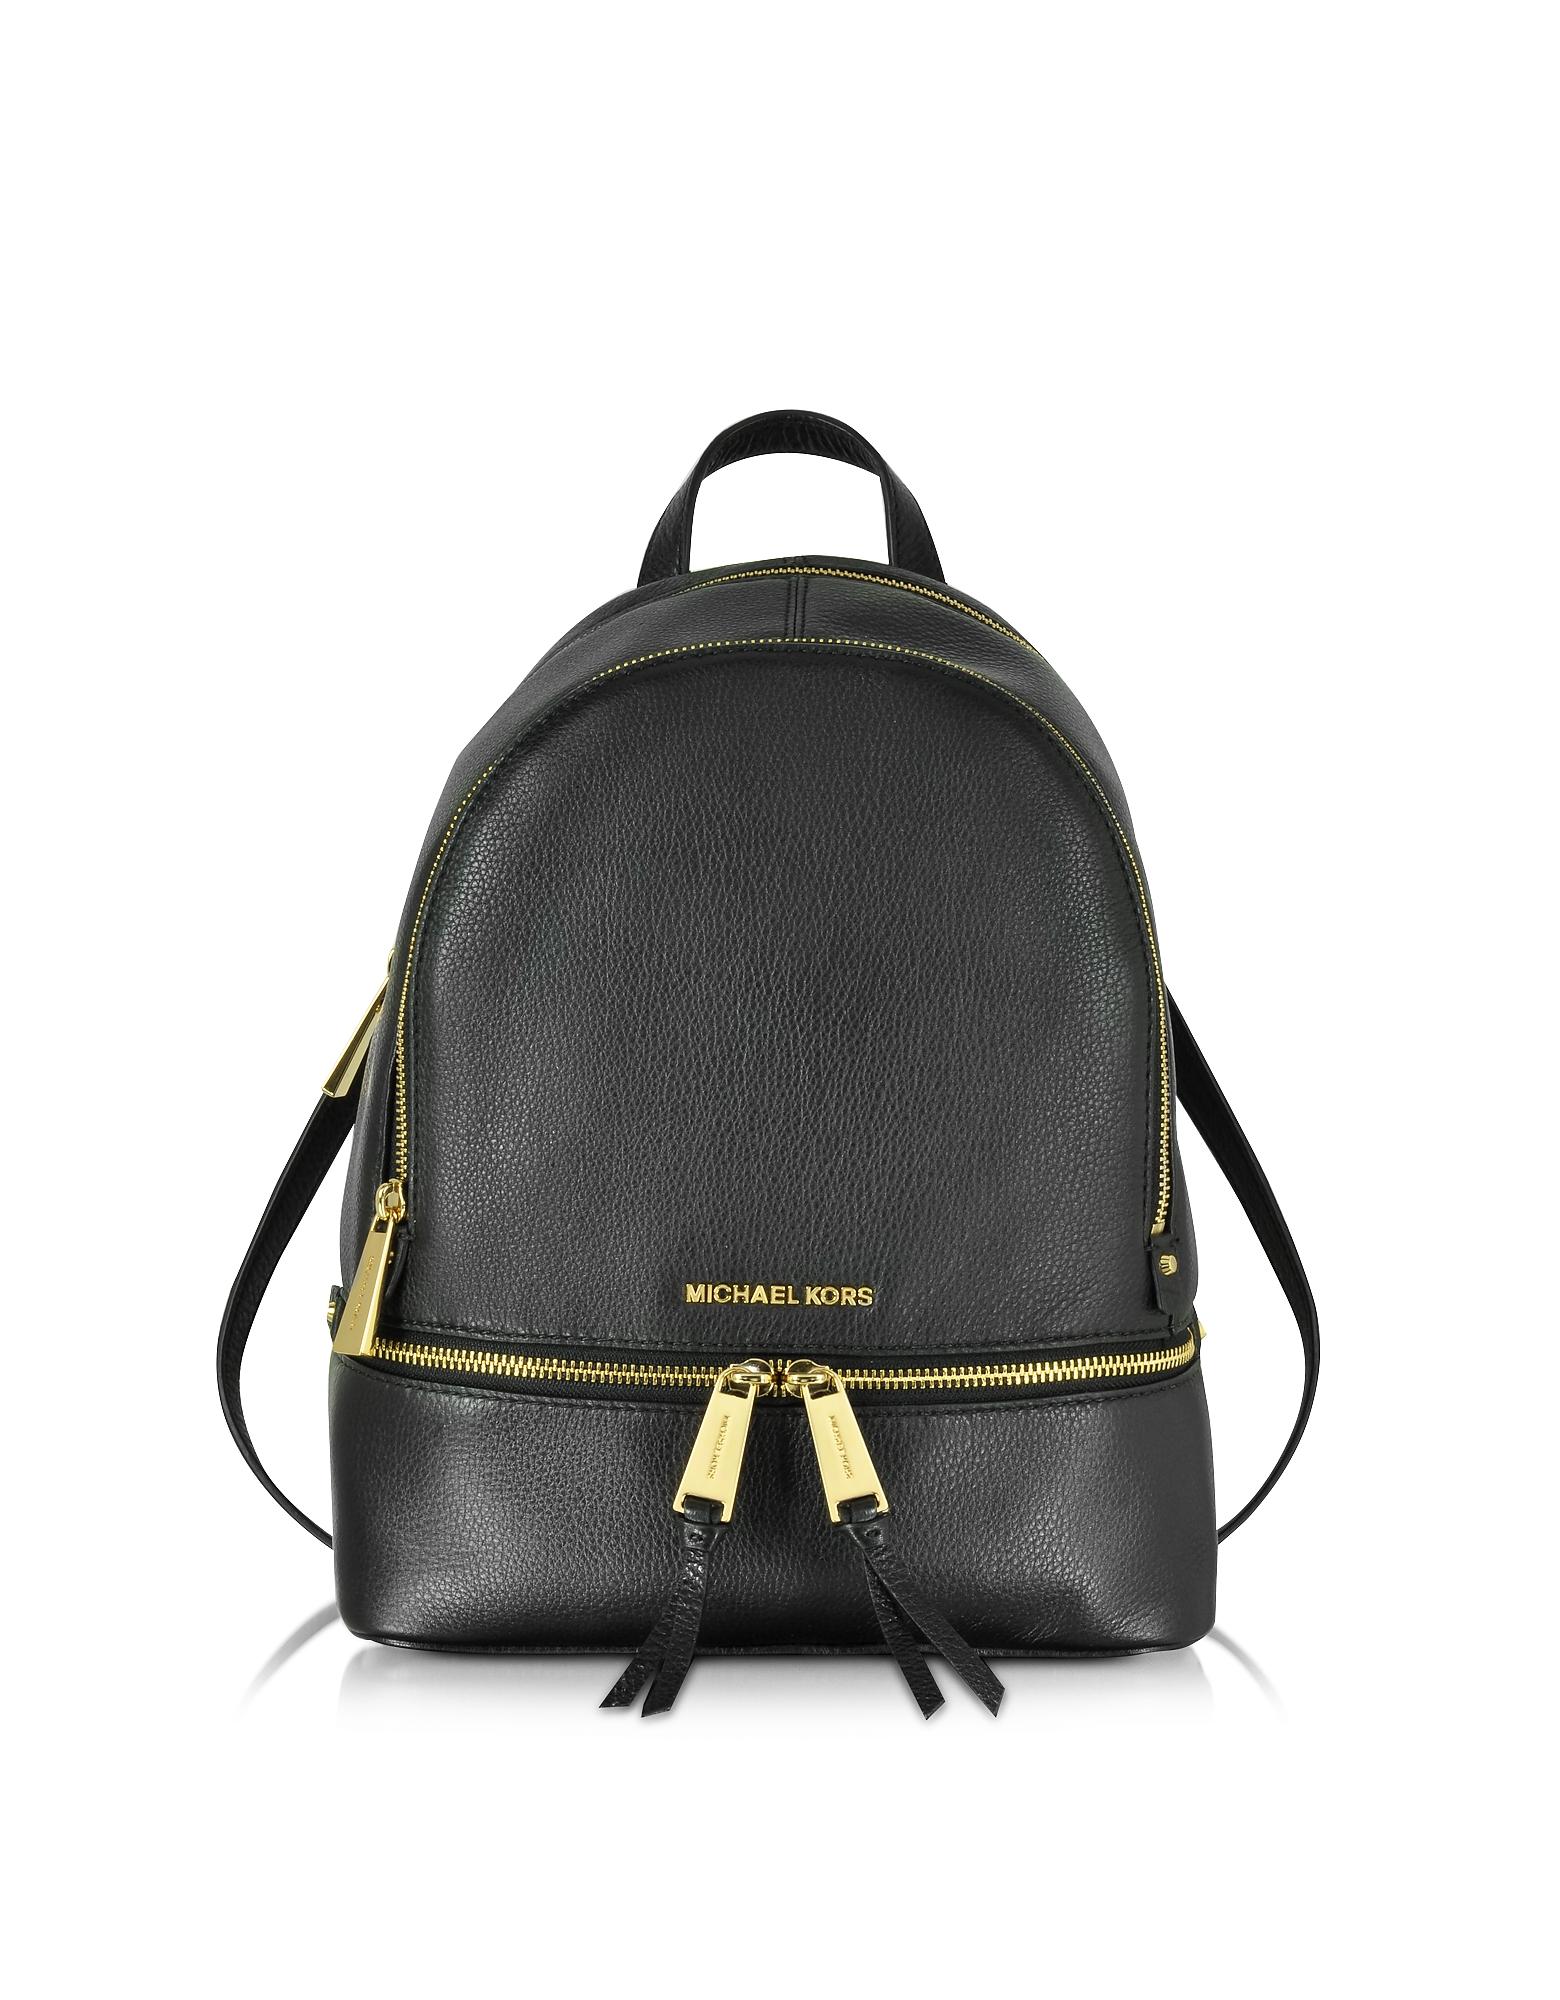 Michael Kors Handbags, Rhea Zip Black Medium Backpack